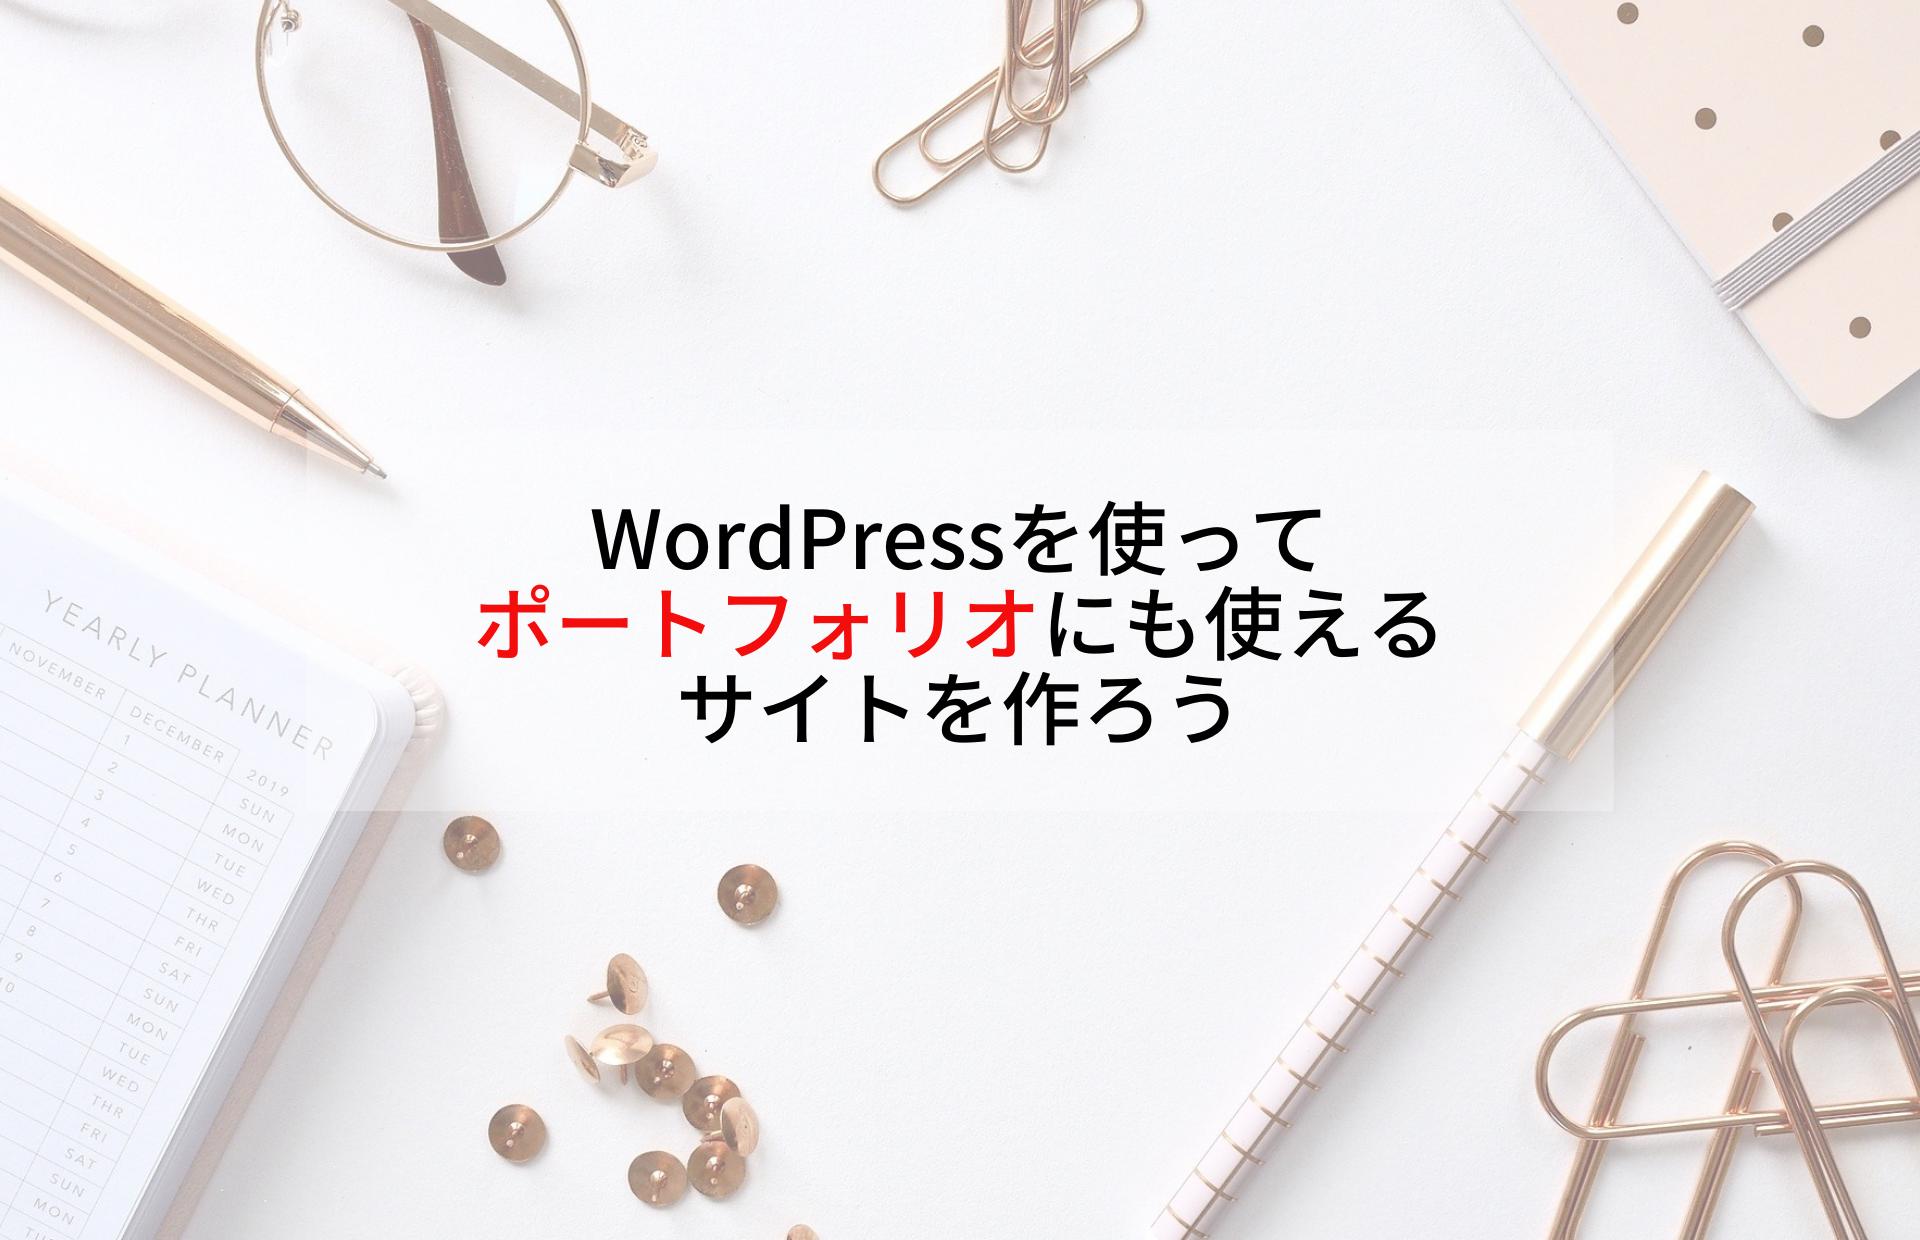 WordPressを使ってポートフォリオにも使えるサイトを作ろう